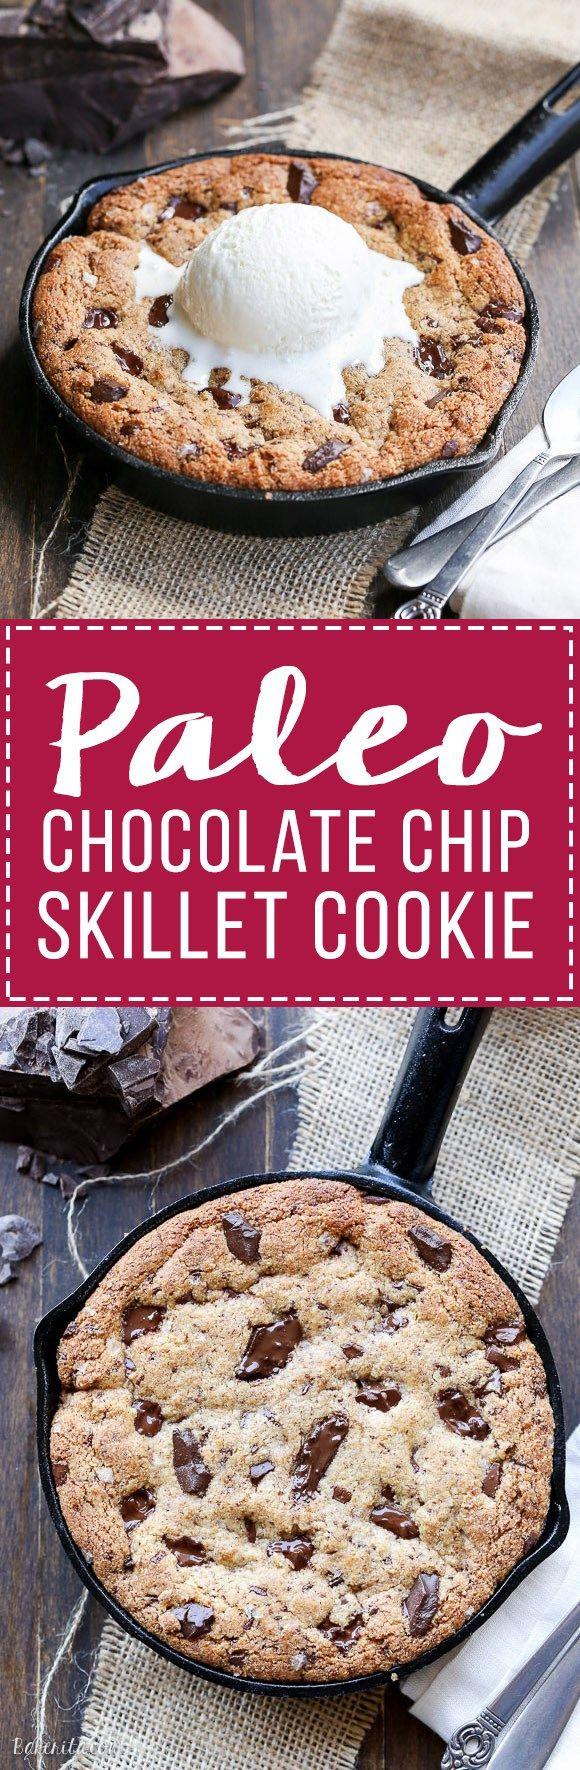 Paleo Chocolate Chip Skillet Cookie